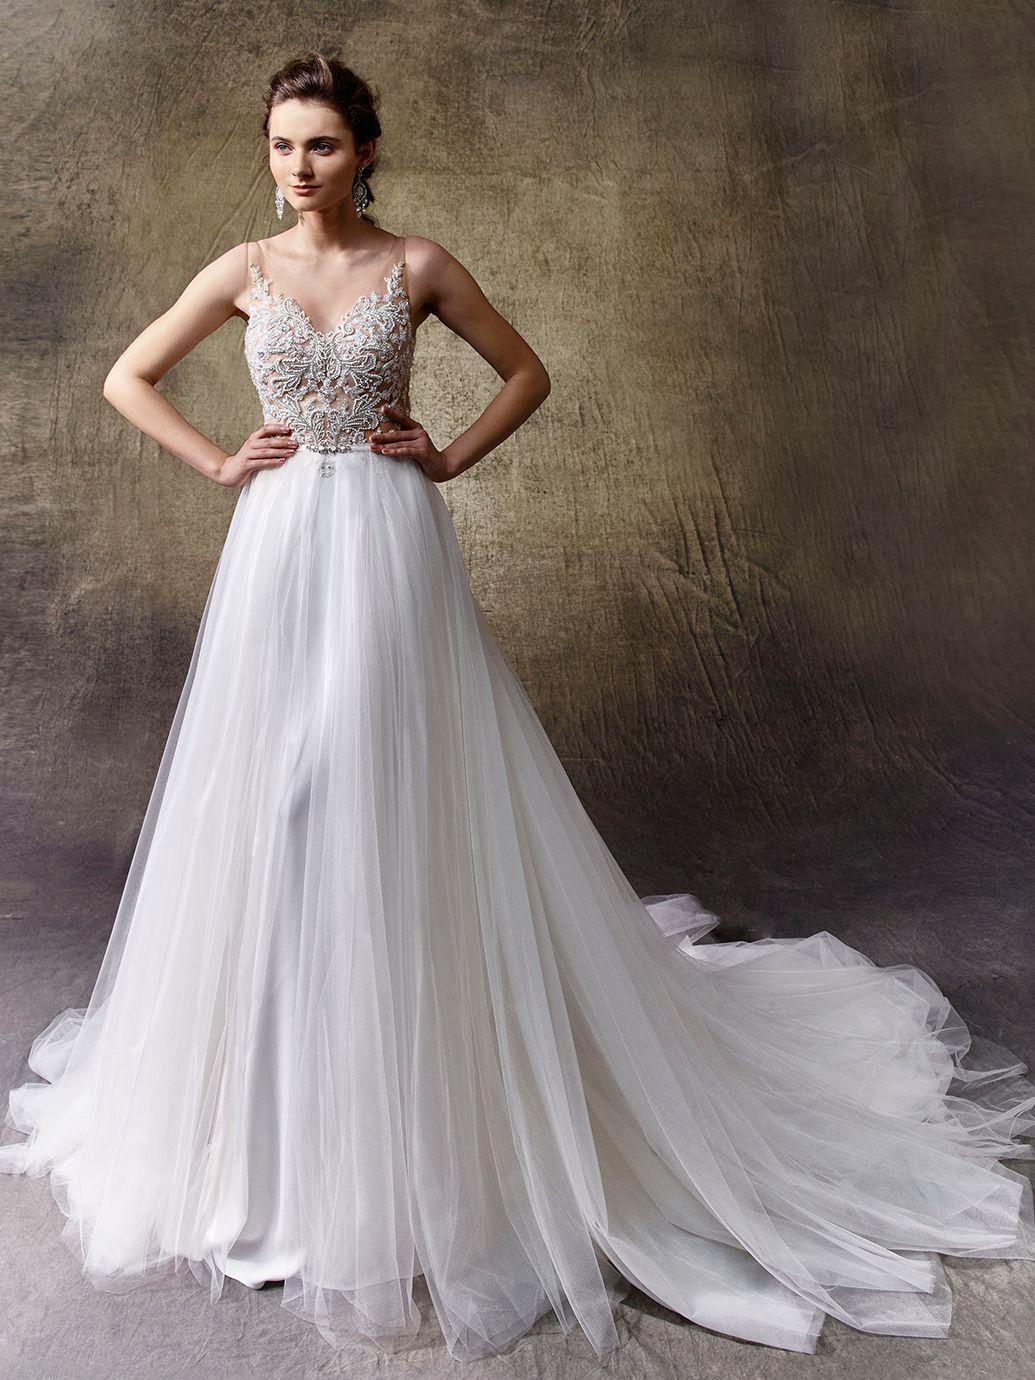 Enzoani Lynn Find Top Designer Wedding Dresses Bridal Gowns At Jaehee